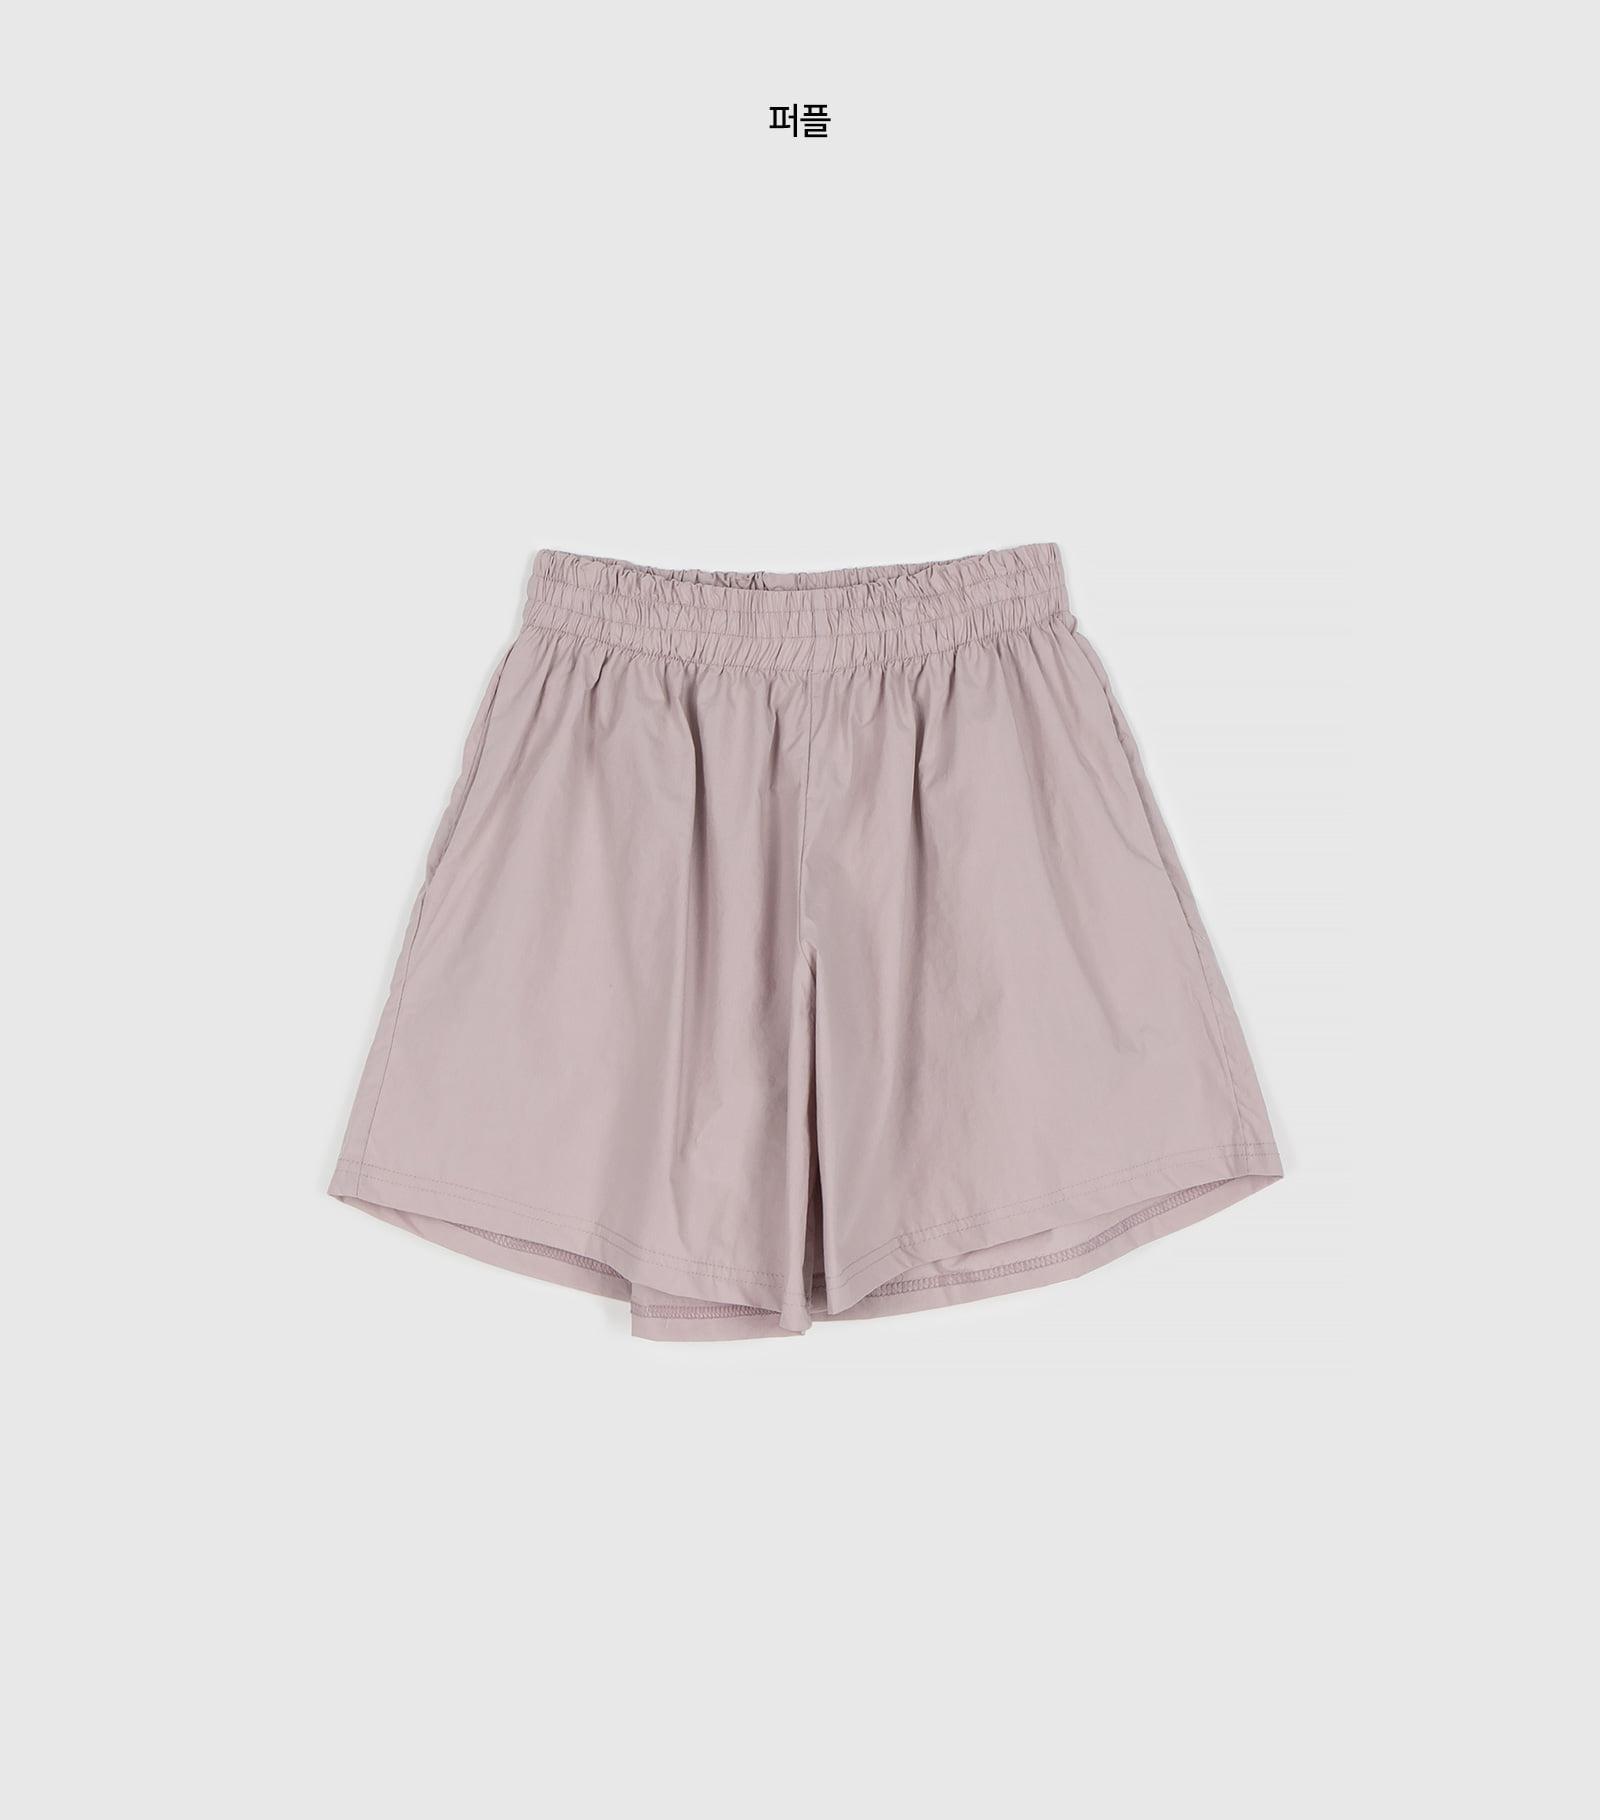 Slide cotton banding shorts